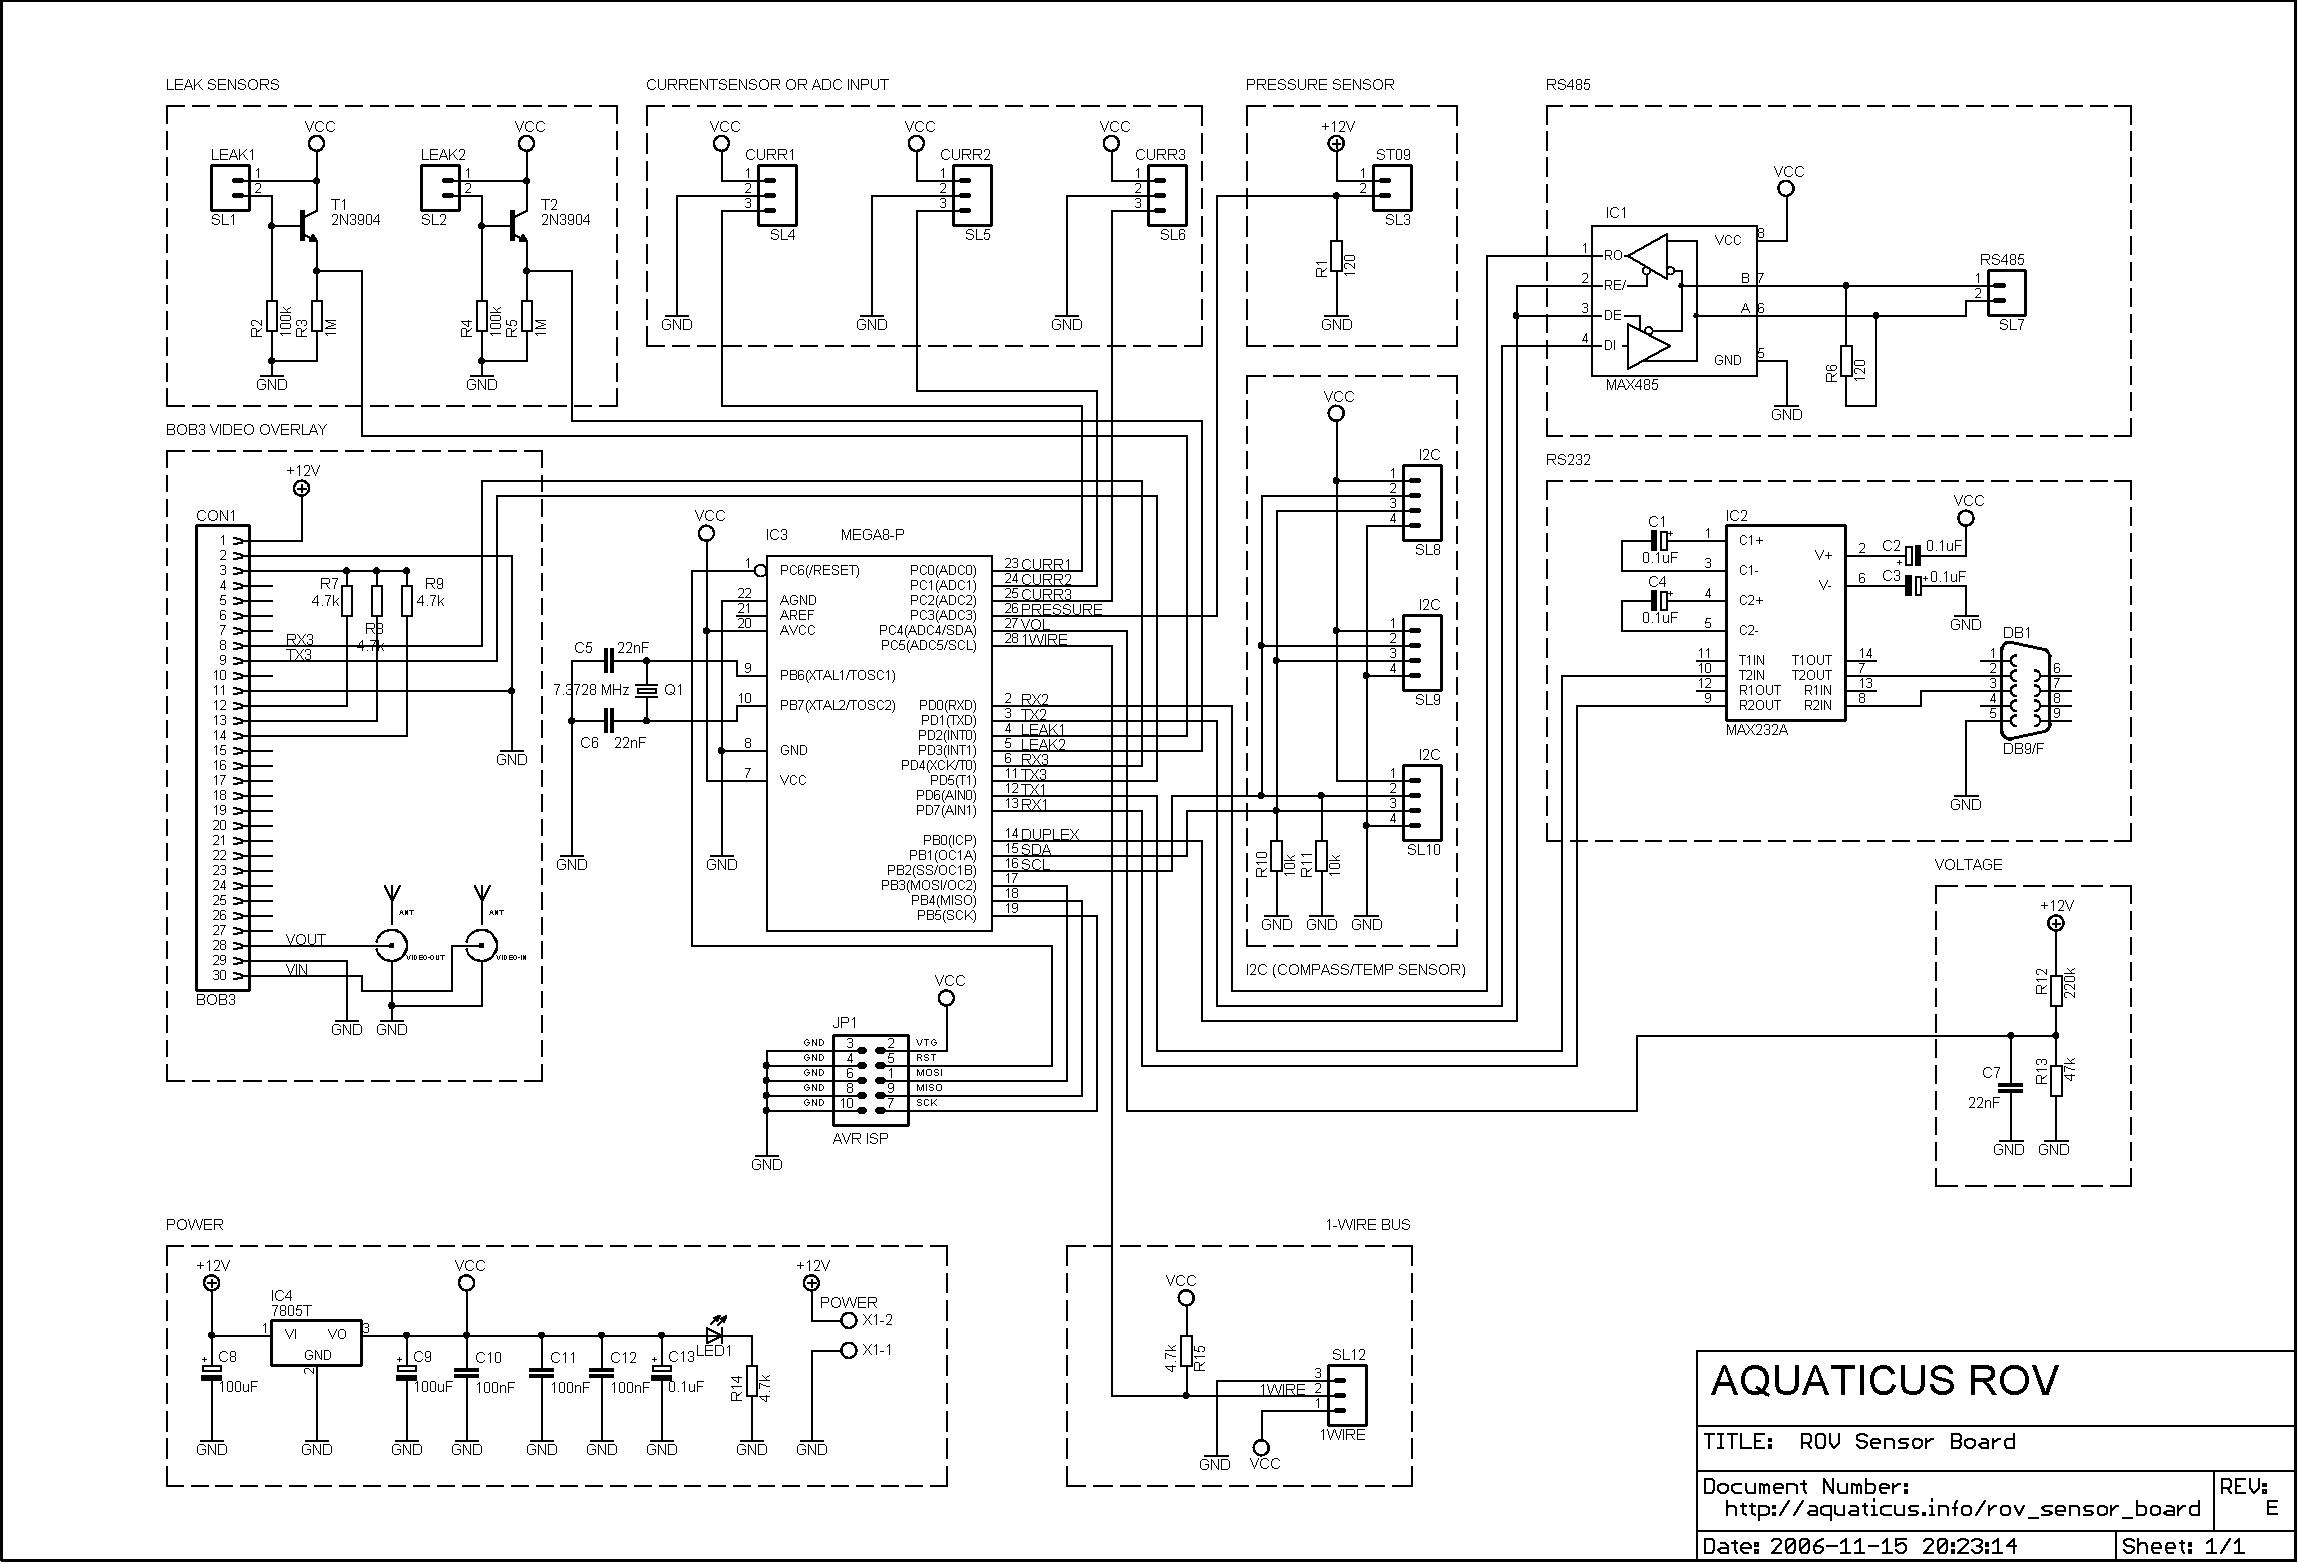 Rov Sensor Board